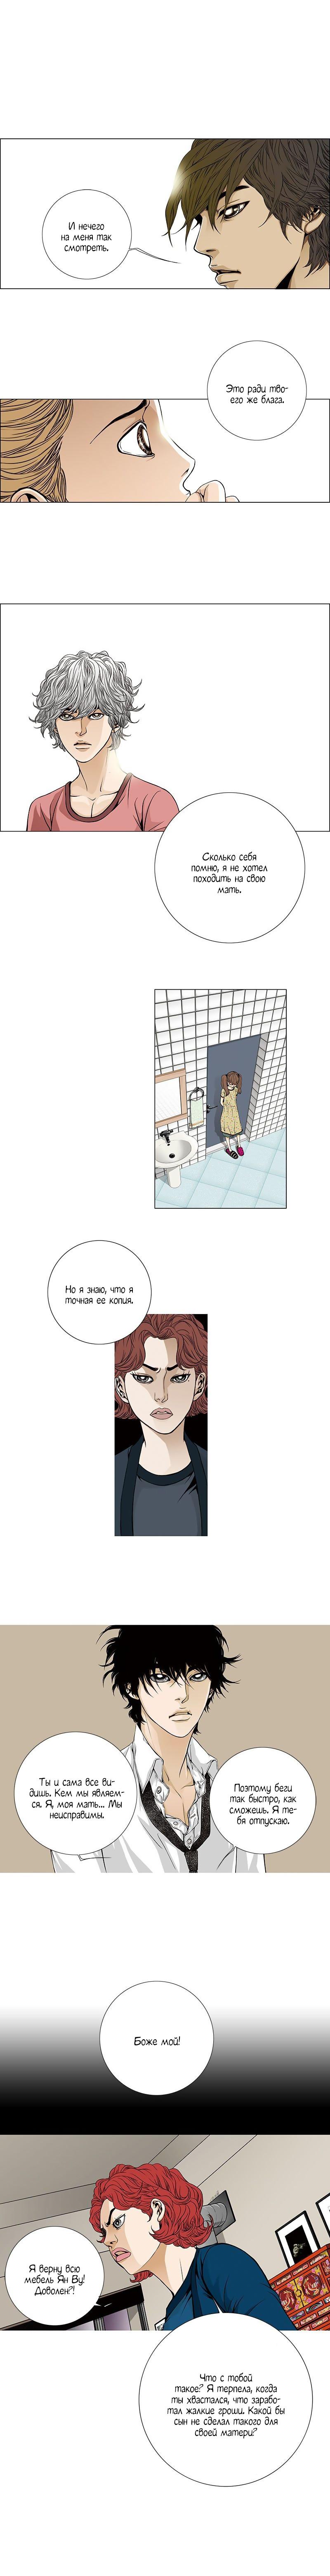 https://r1.ninemanga.com/comics/pic2/29/28573/344297/1512077508384.jpg Page 2